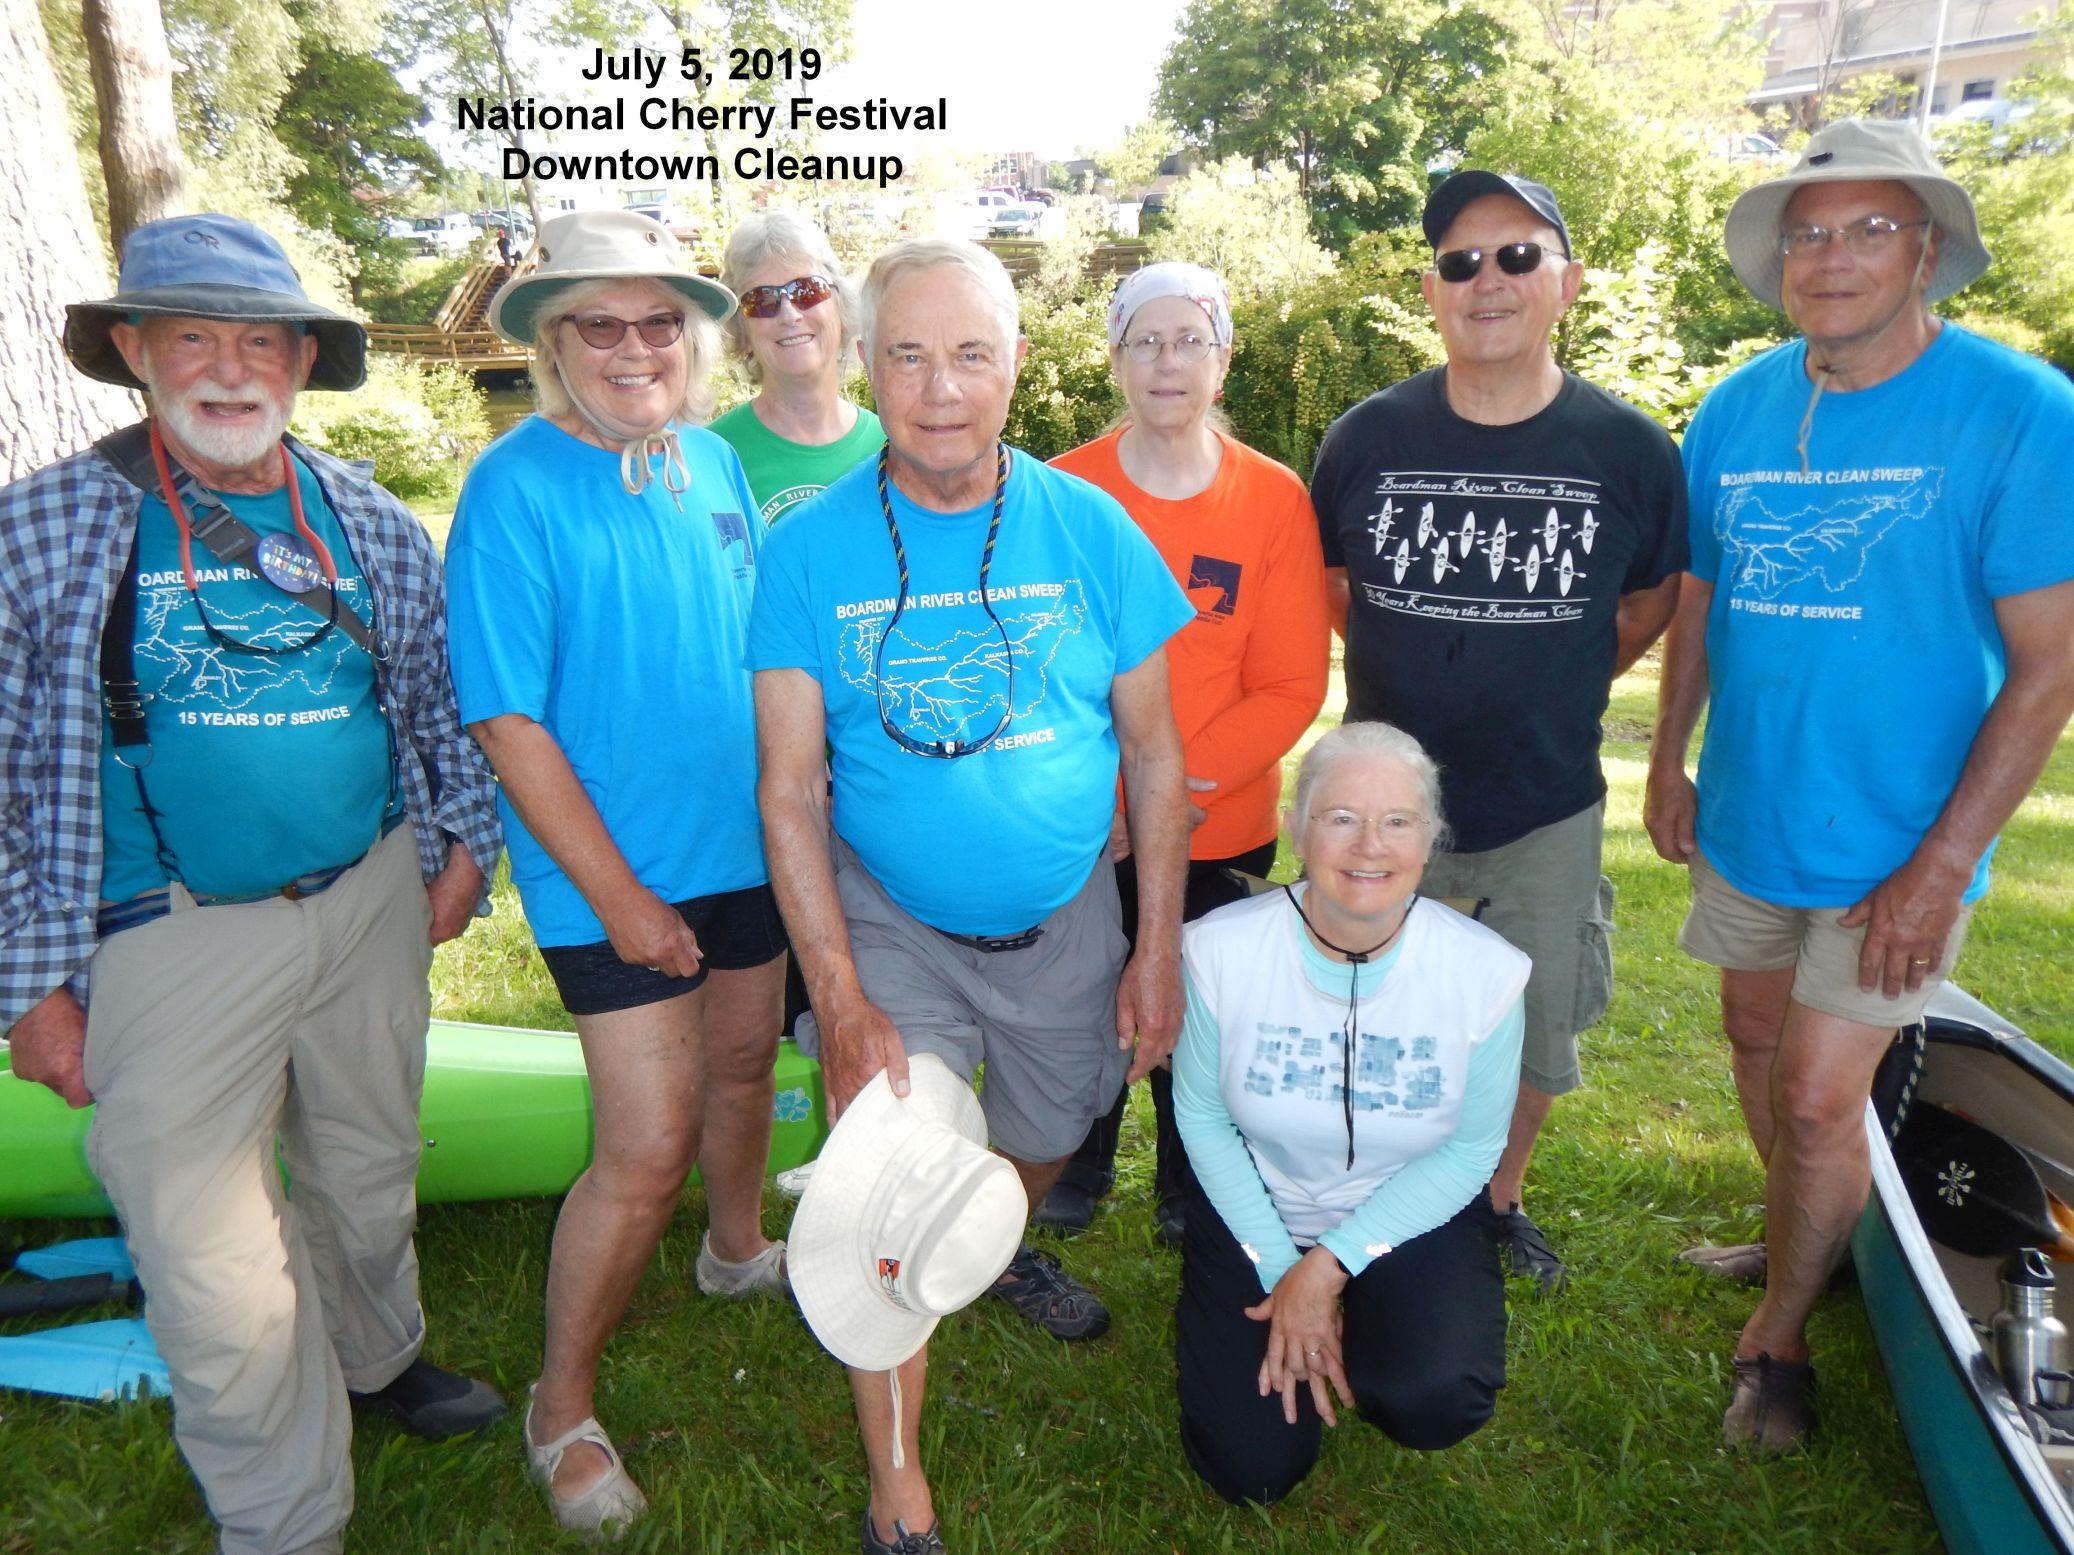 All July 5 - BRCS - NCF 2019 Photos